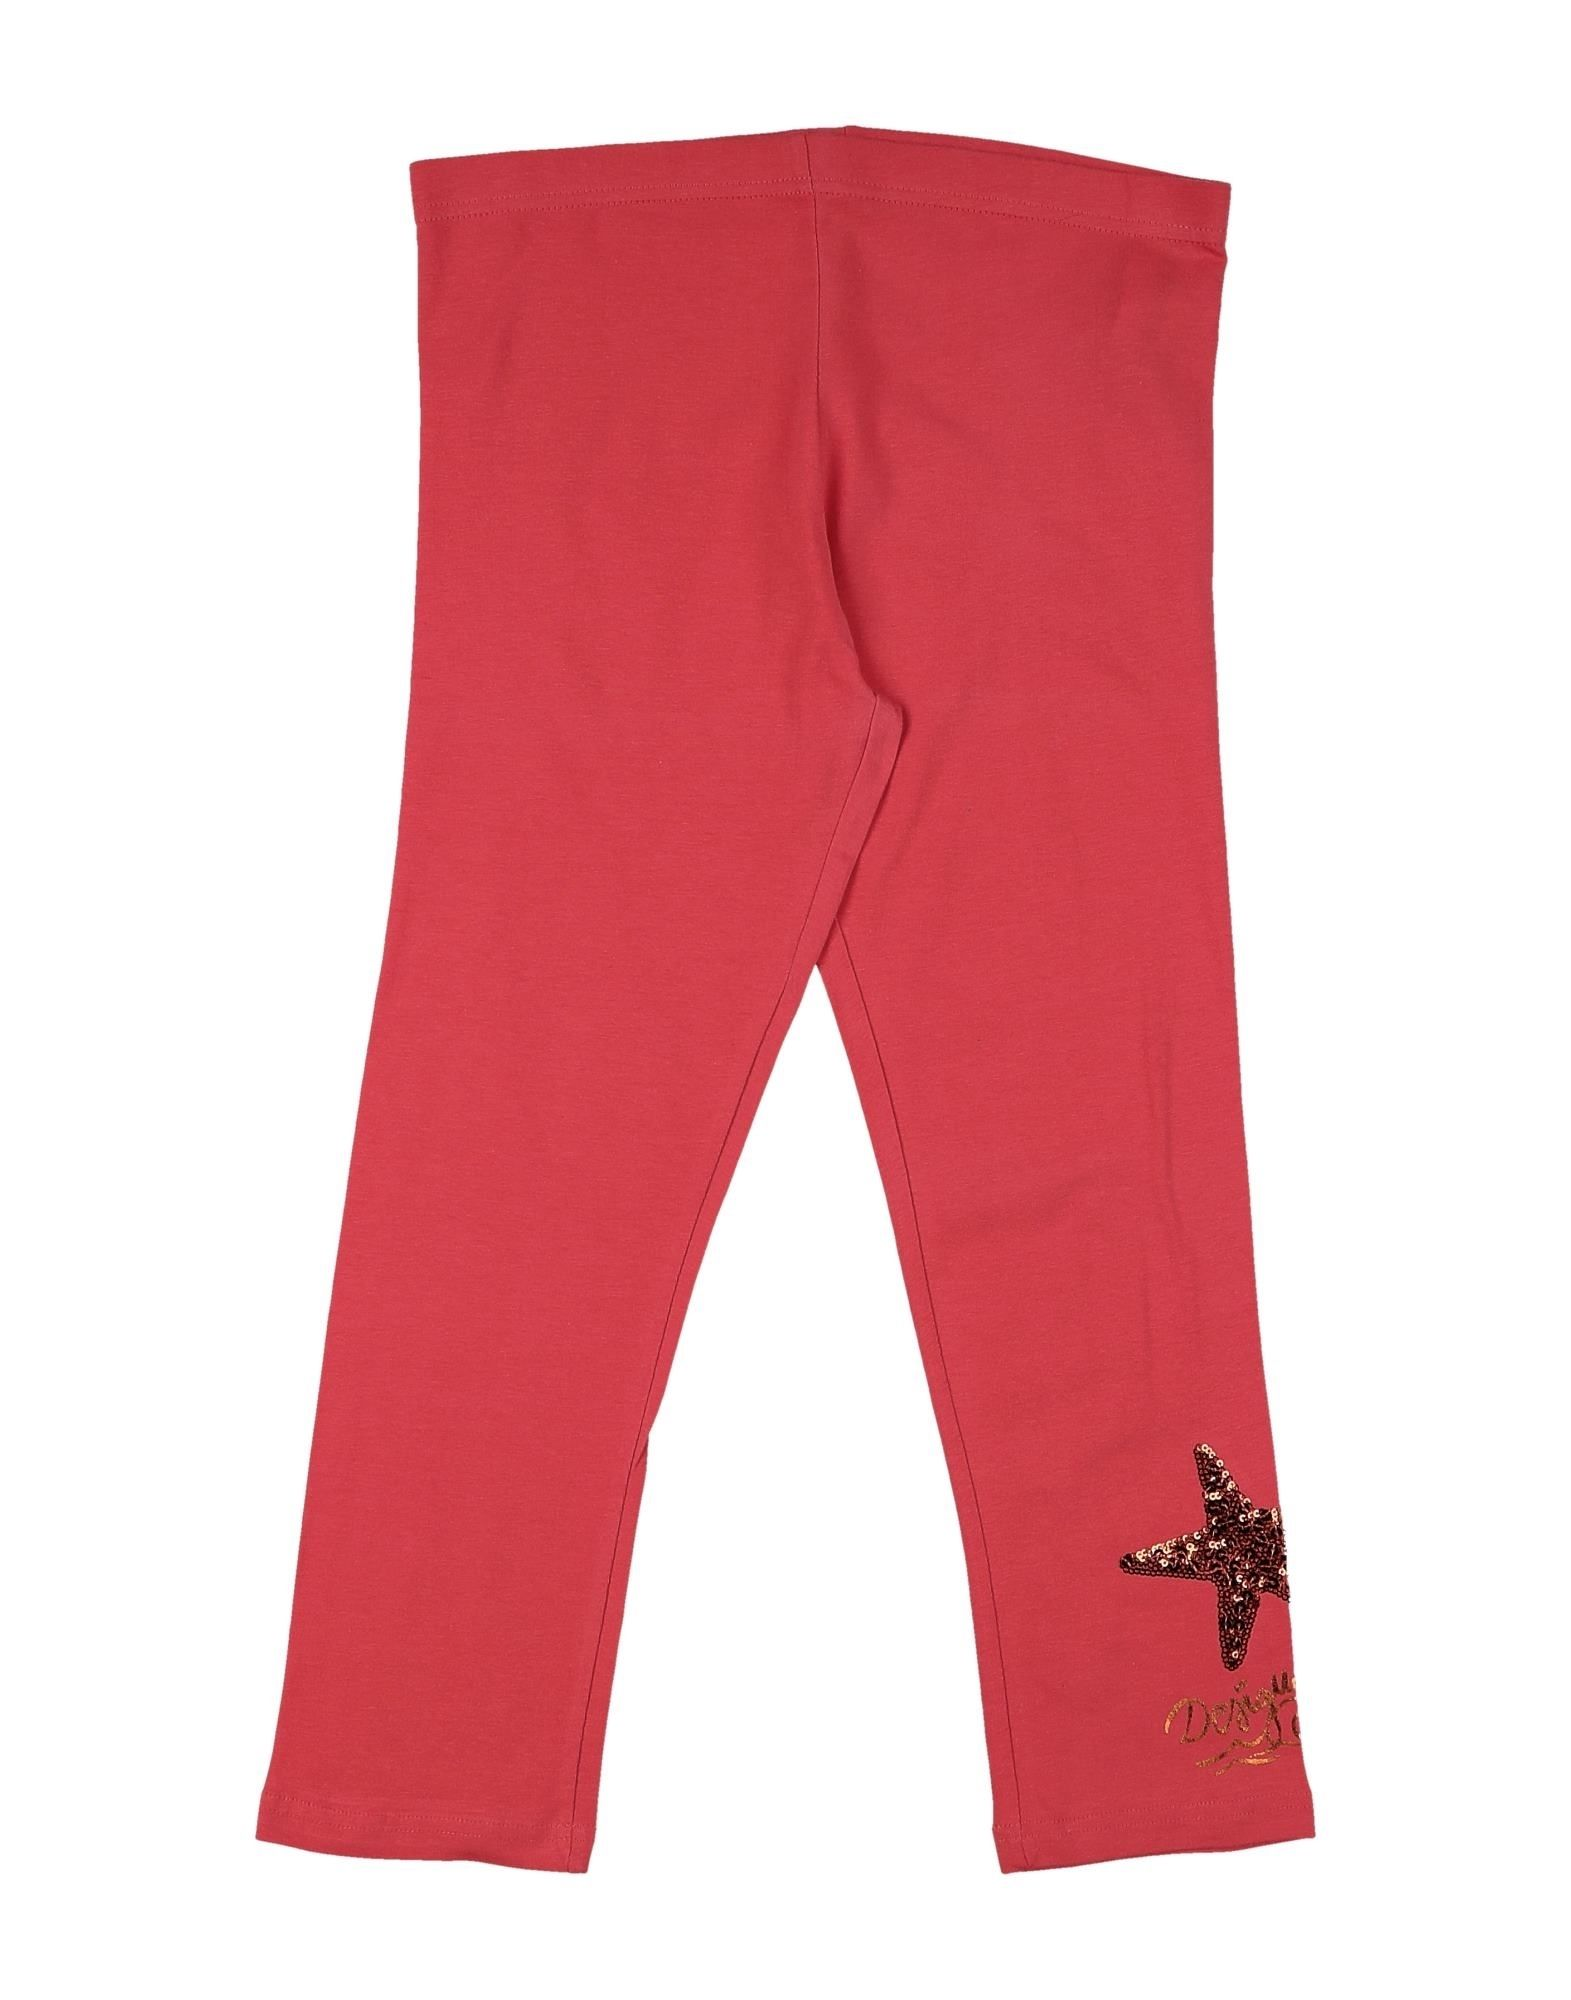 Desigual Kids' Leggings In Red